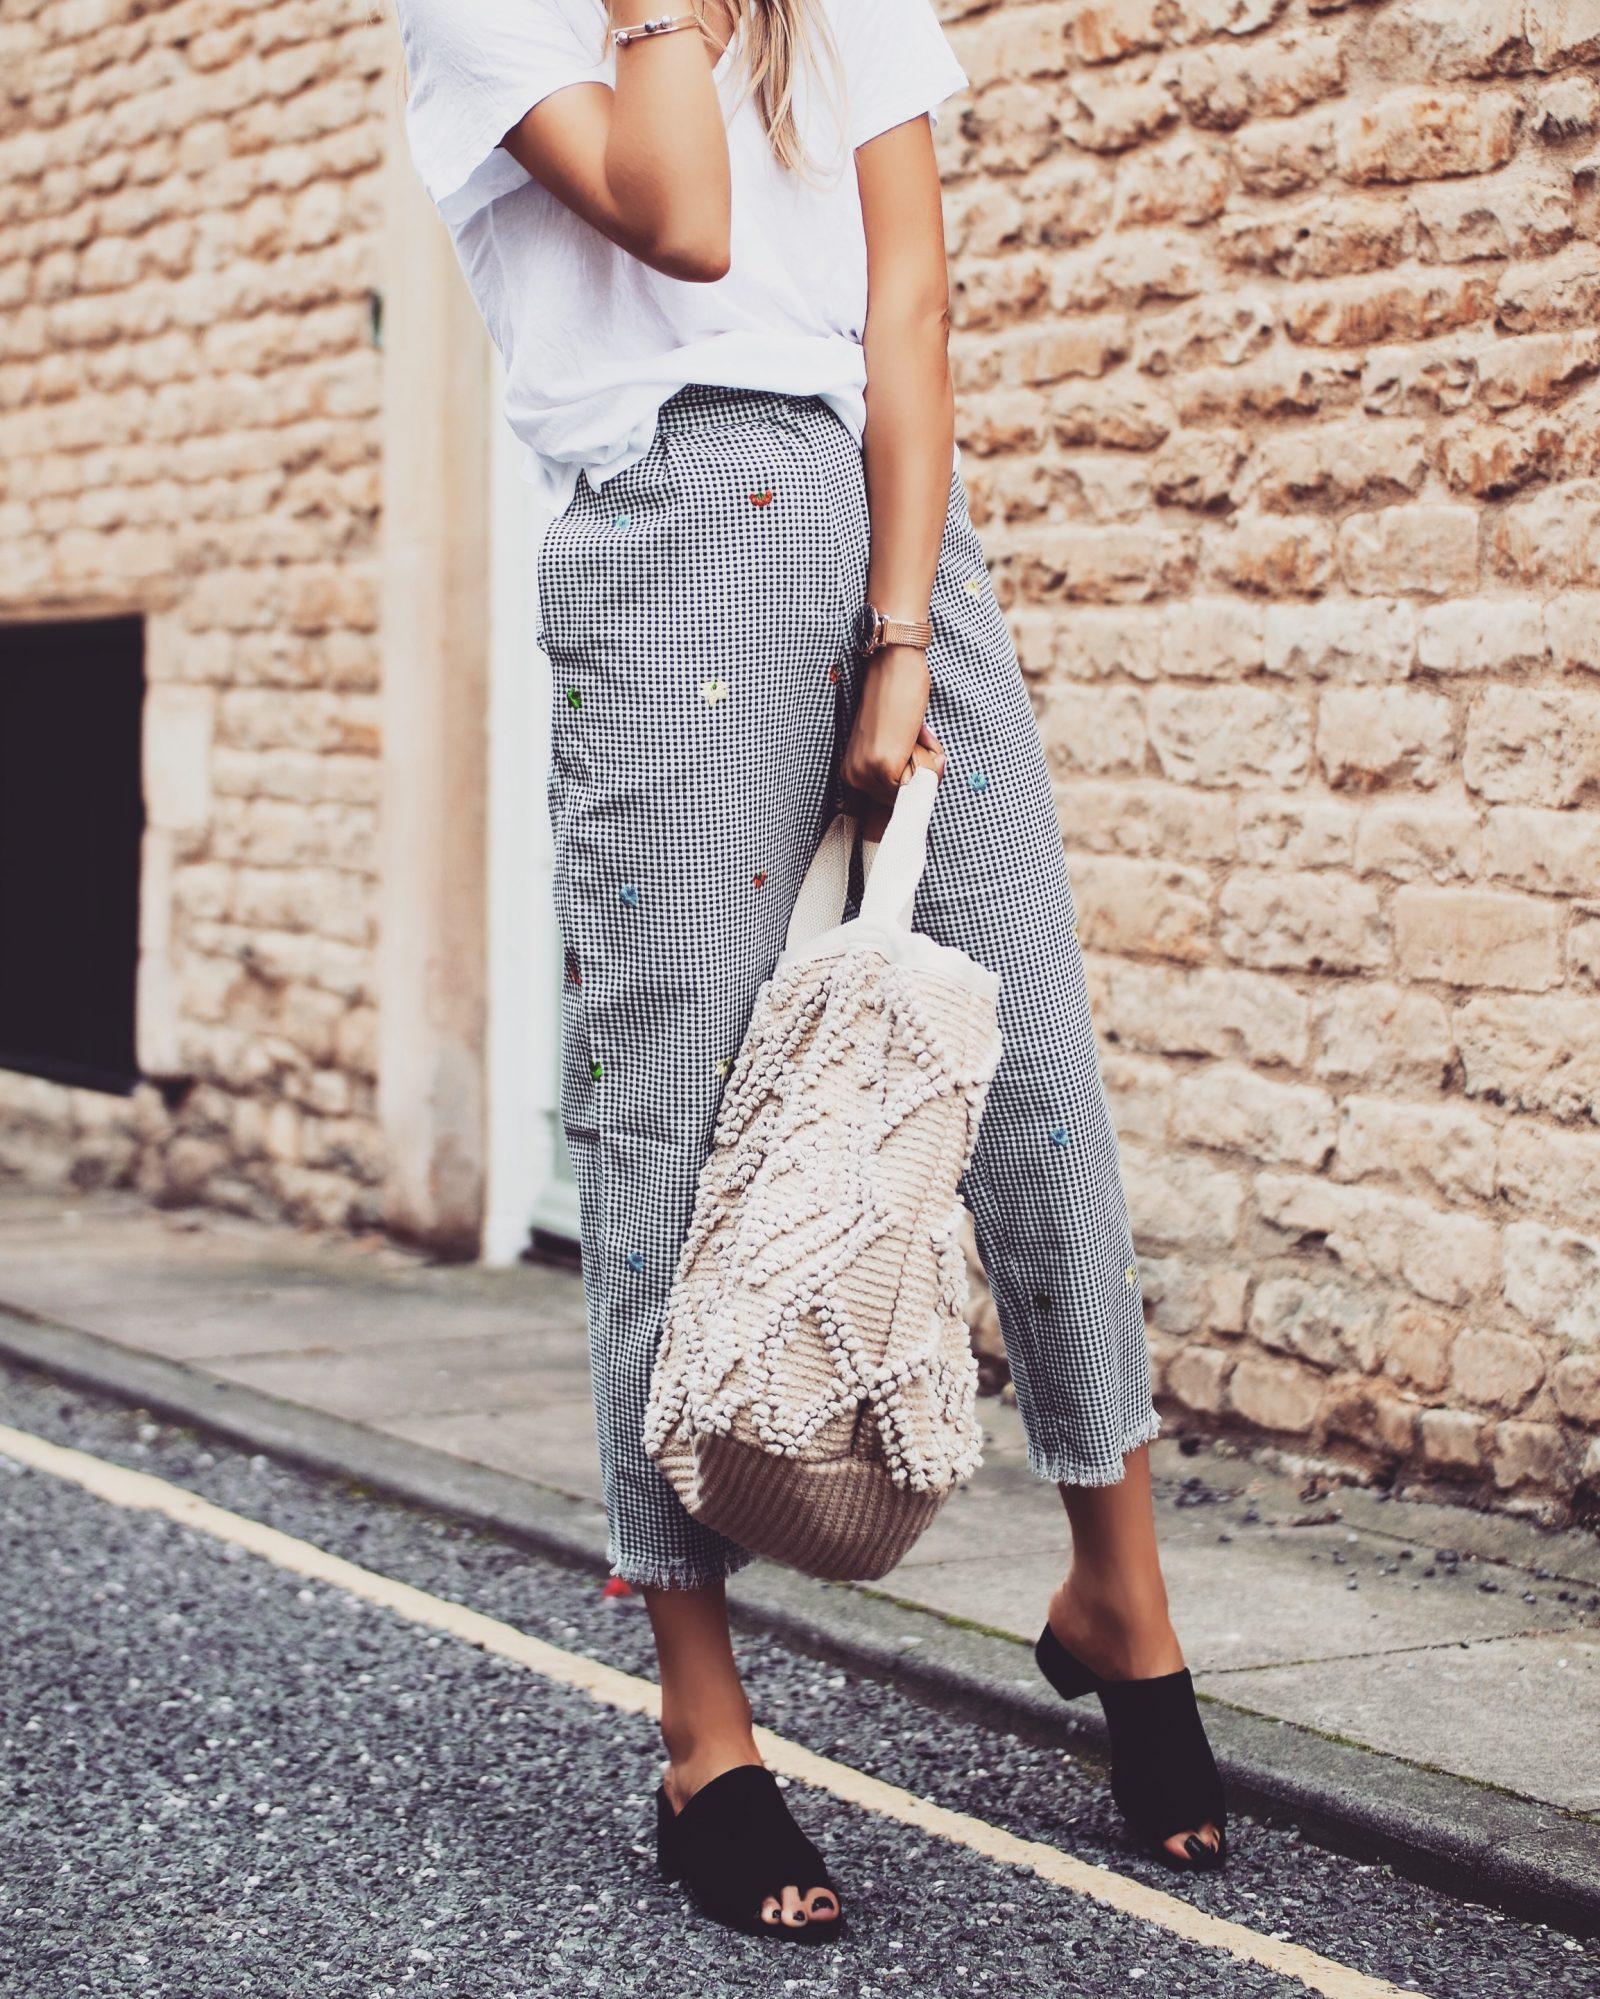 Topshop Gingham Trousers - Non Denim Bottoms - Basket Bag